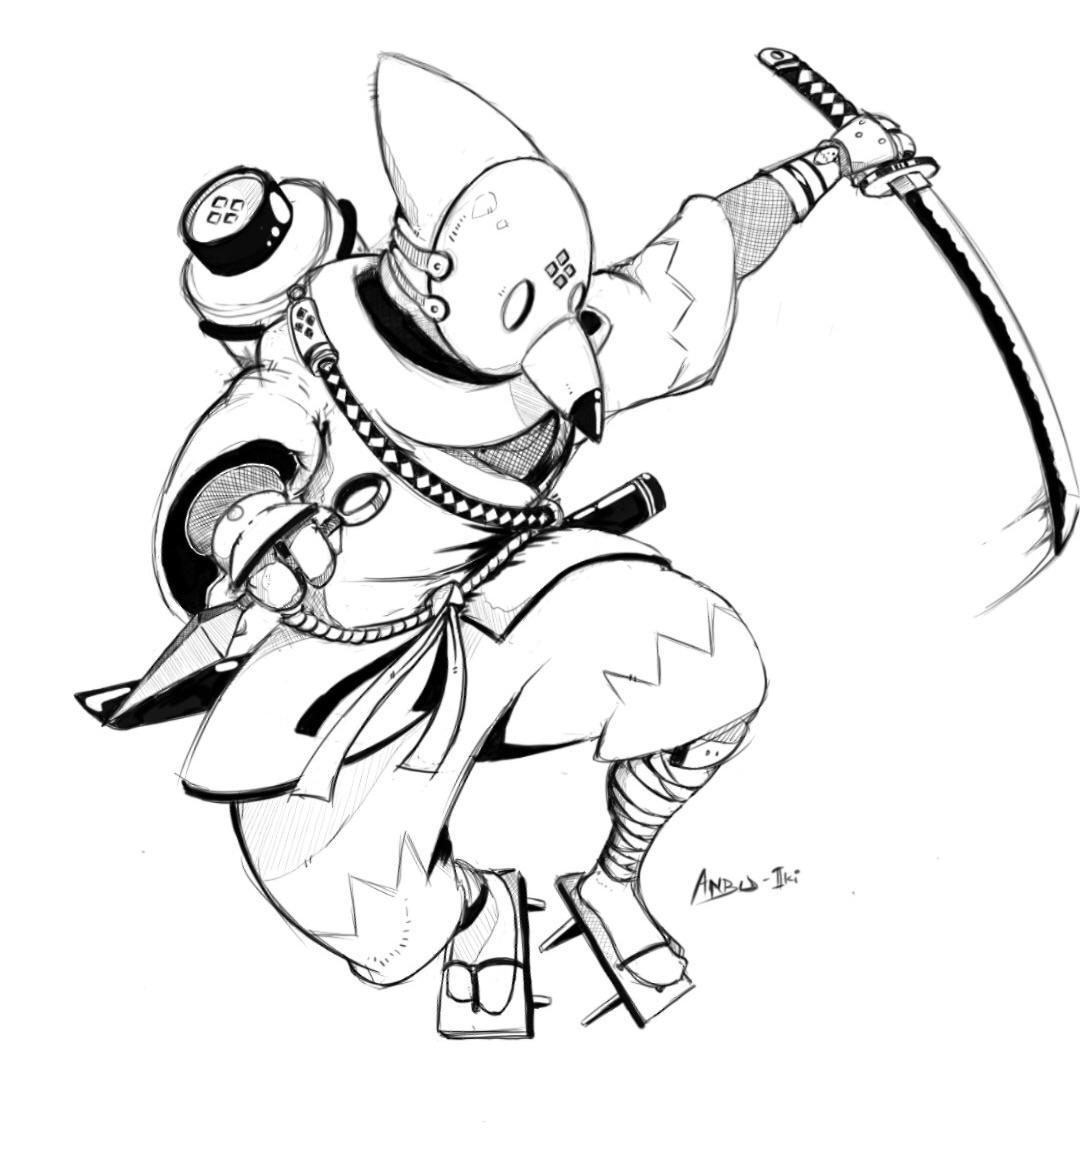 Artwork: My original Anbu : Naruto